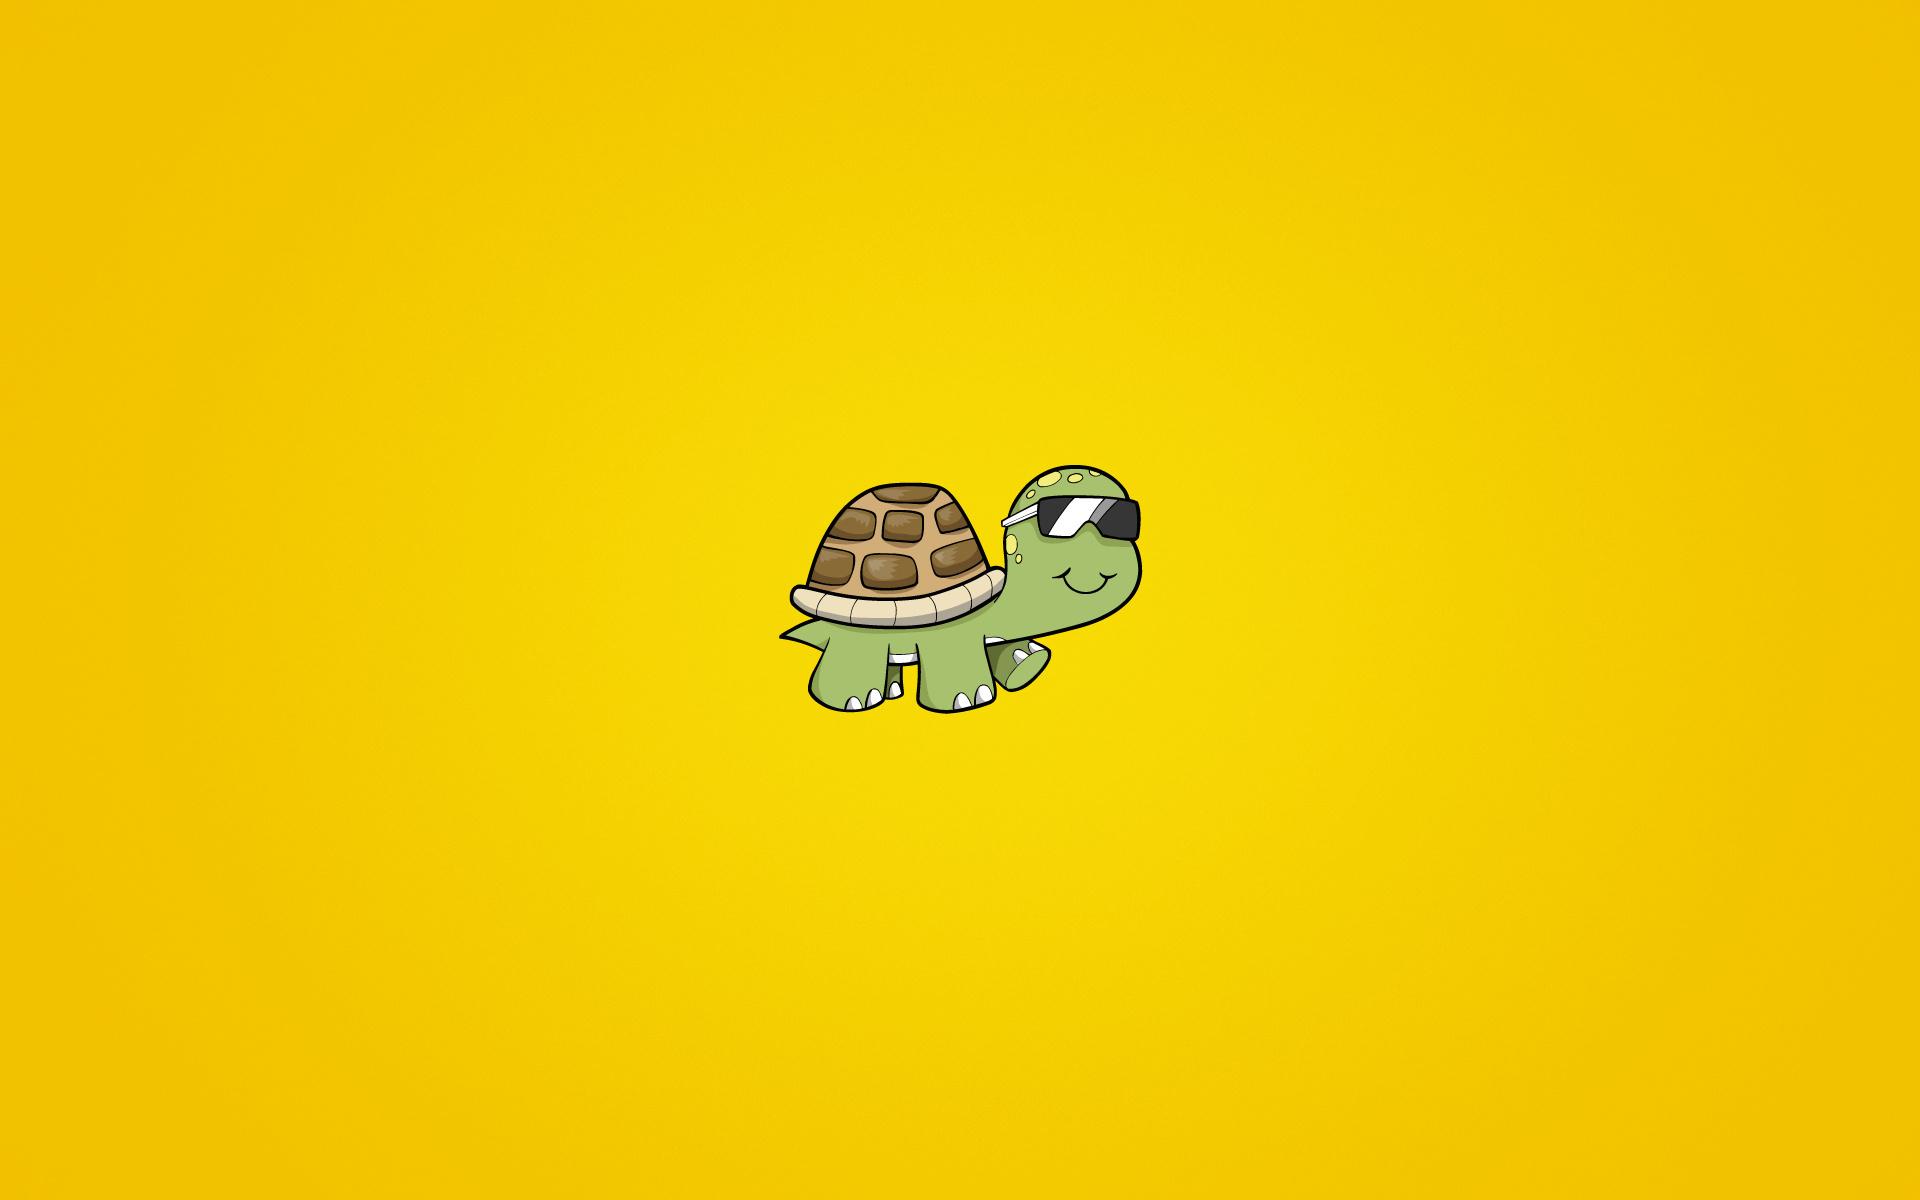 Image: Bug, glasses, yellow, background, smiling